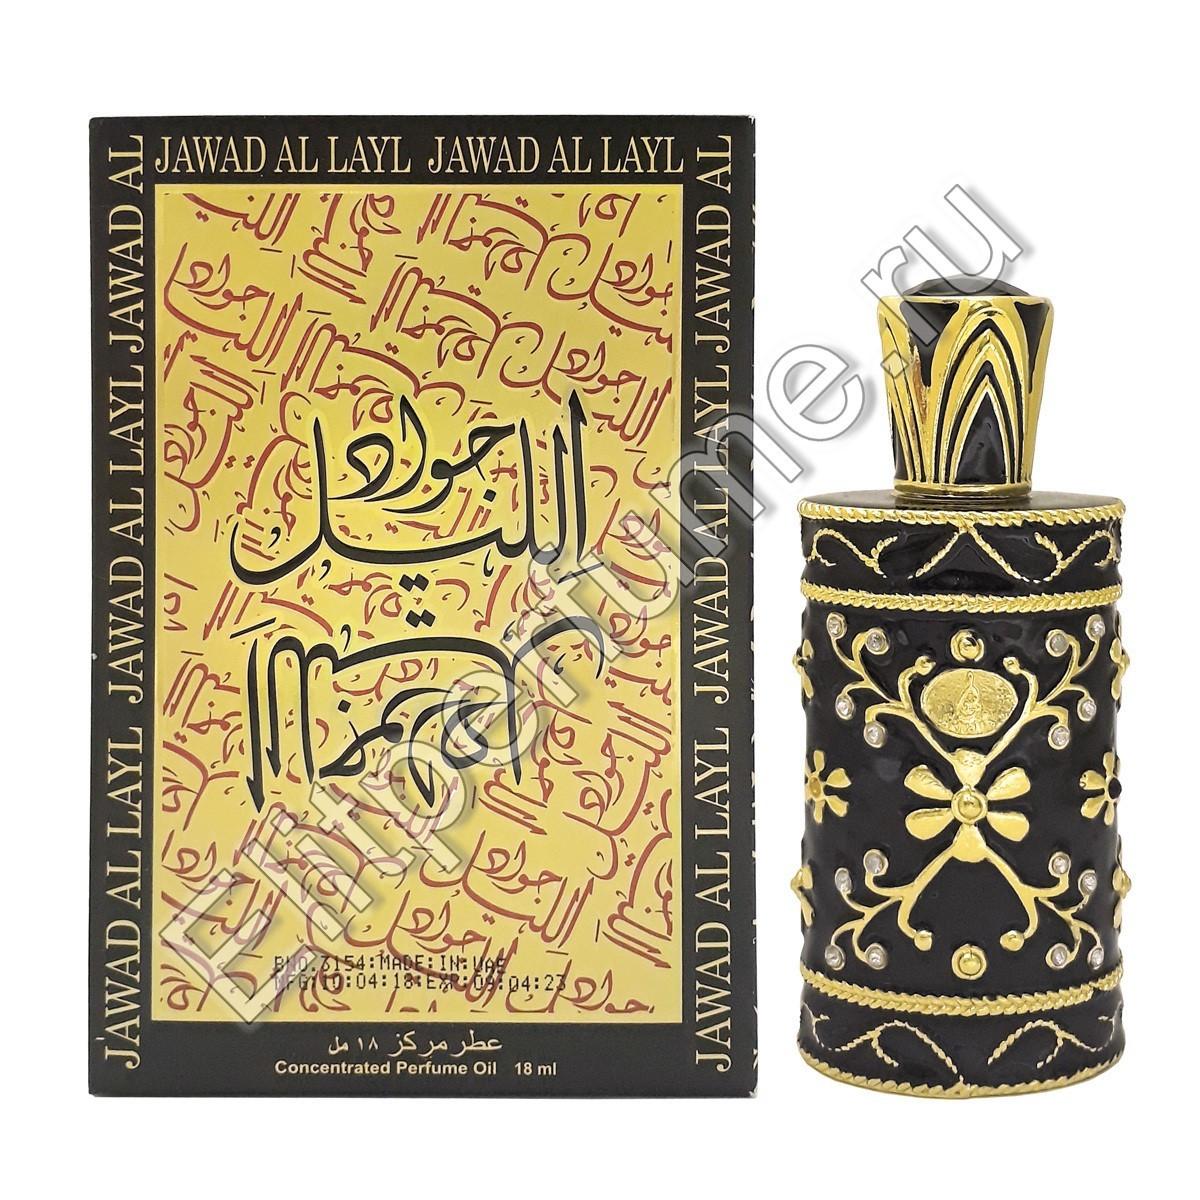 Jawad Al Layl 18 мл арабские масляные духи от Халис Khalis Perfumes